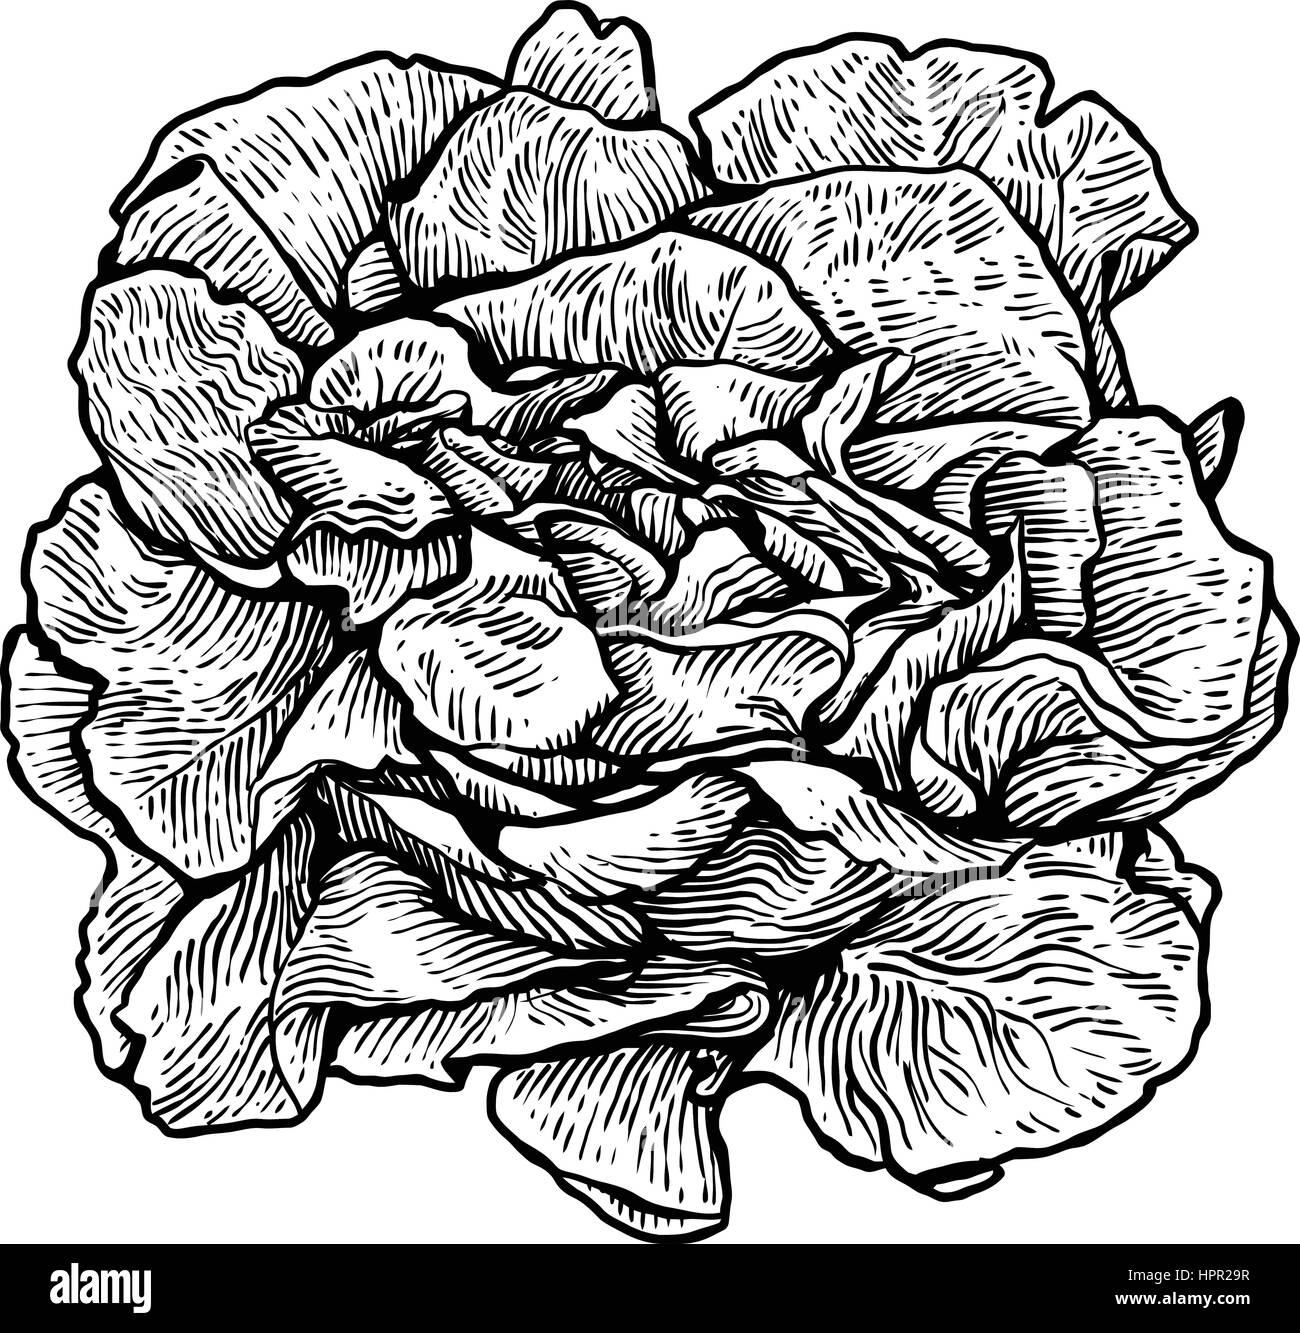 Salade De Laitue Illustration Dessin Gravure Dessin Au